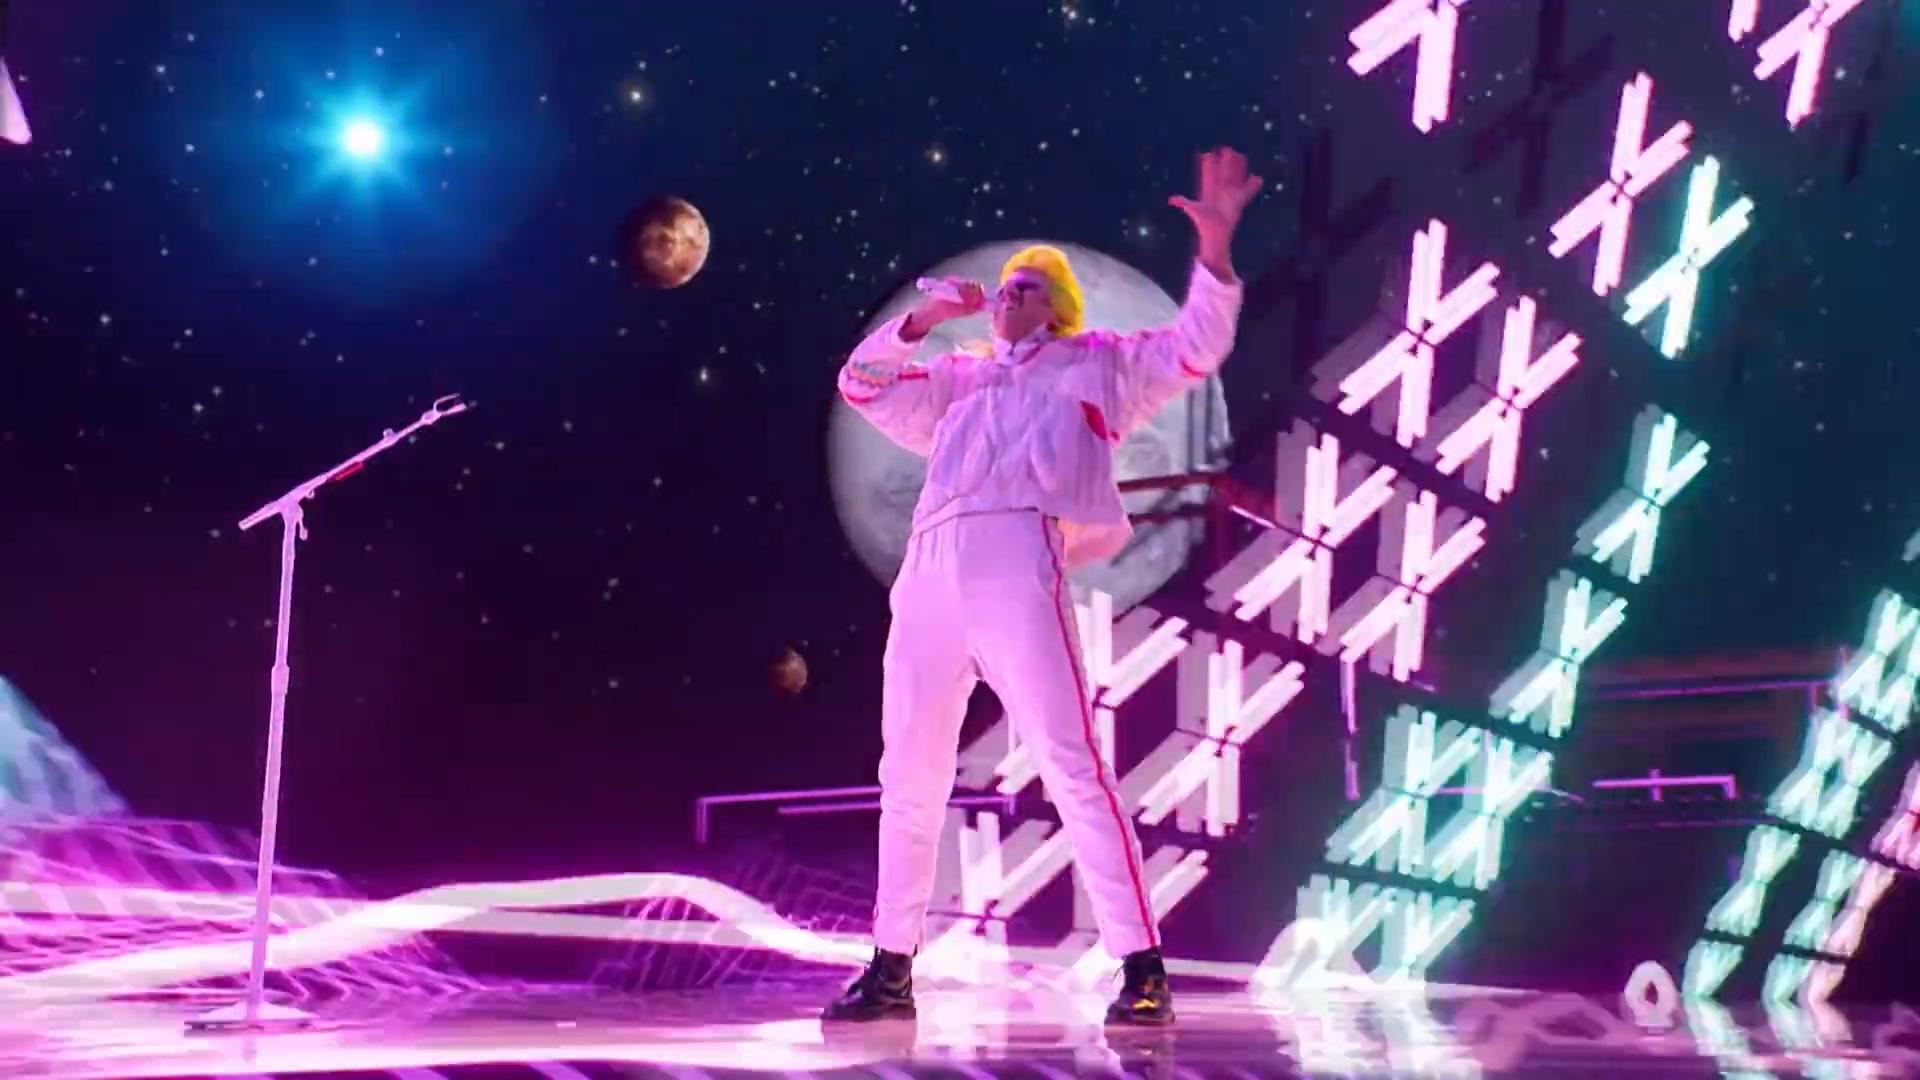 BONAVEGA Delivers Glam Rock Rendition of Blinding Lights by The Weeknd – America's Got Talent 2020.00_00_43_04.Still003